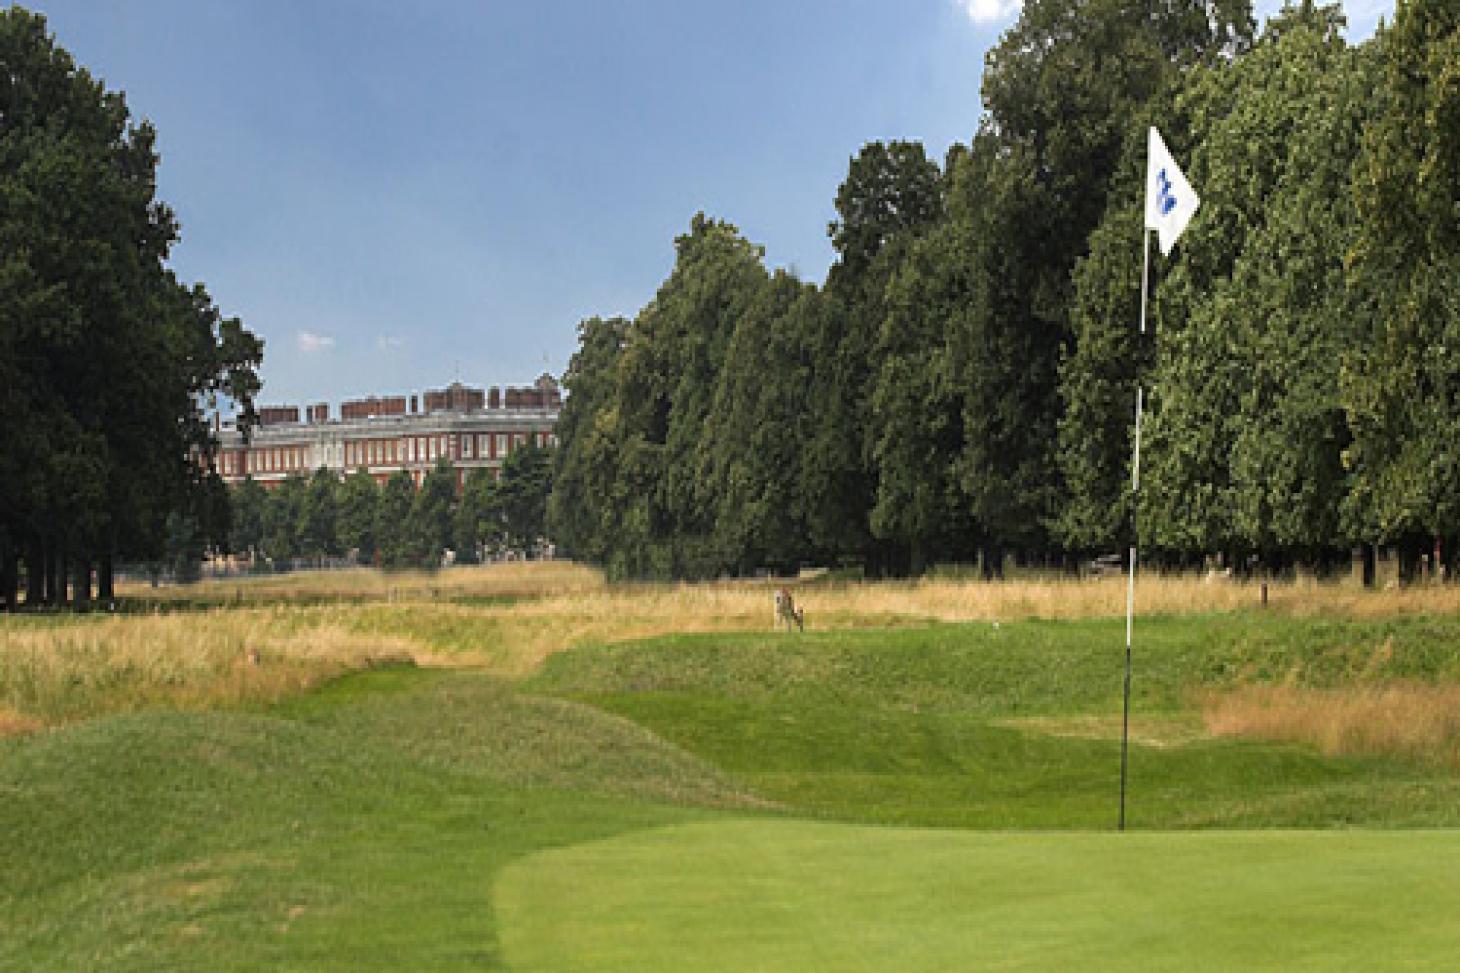 Hampton Court Palace Golf Club 18 hole golf course